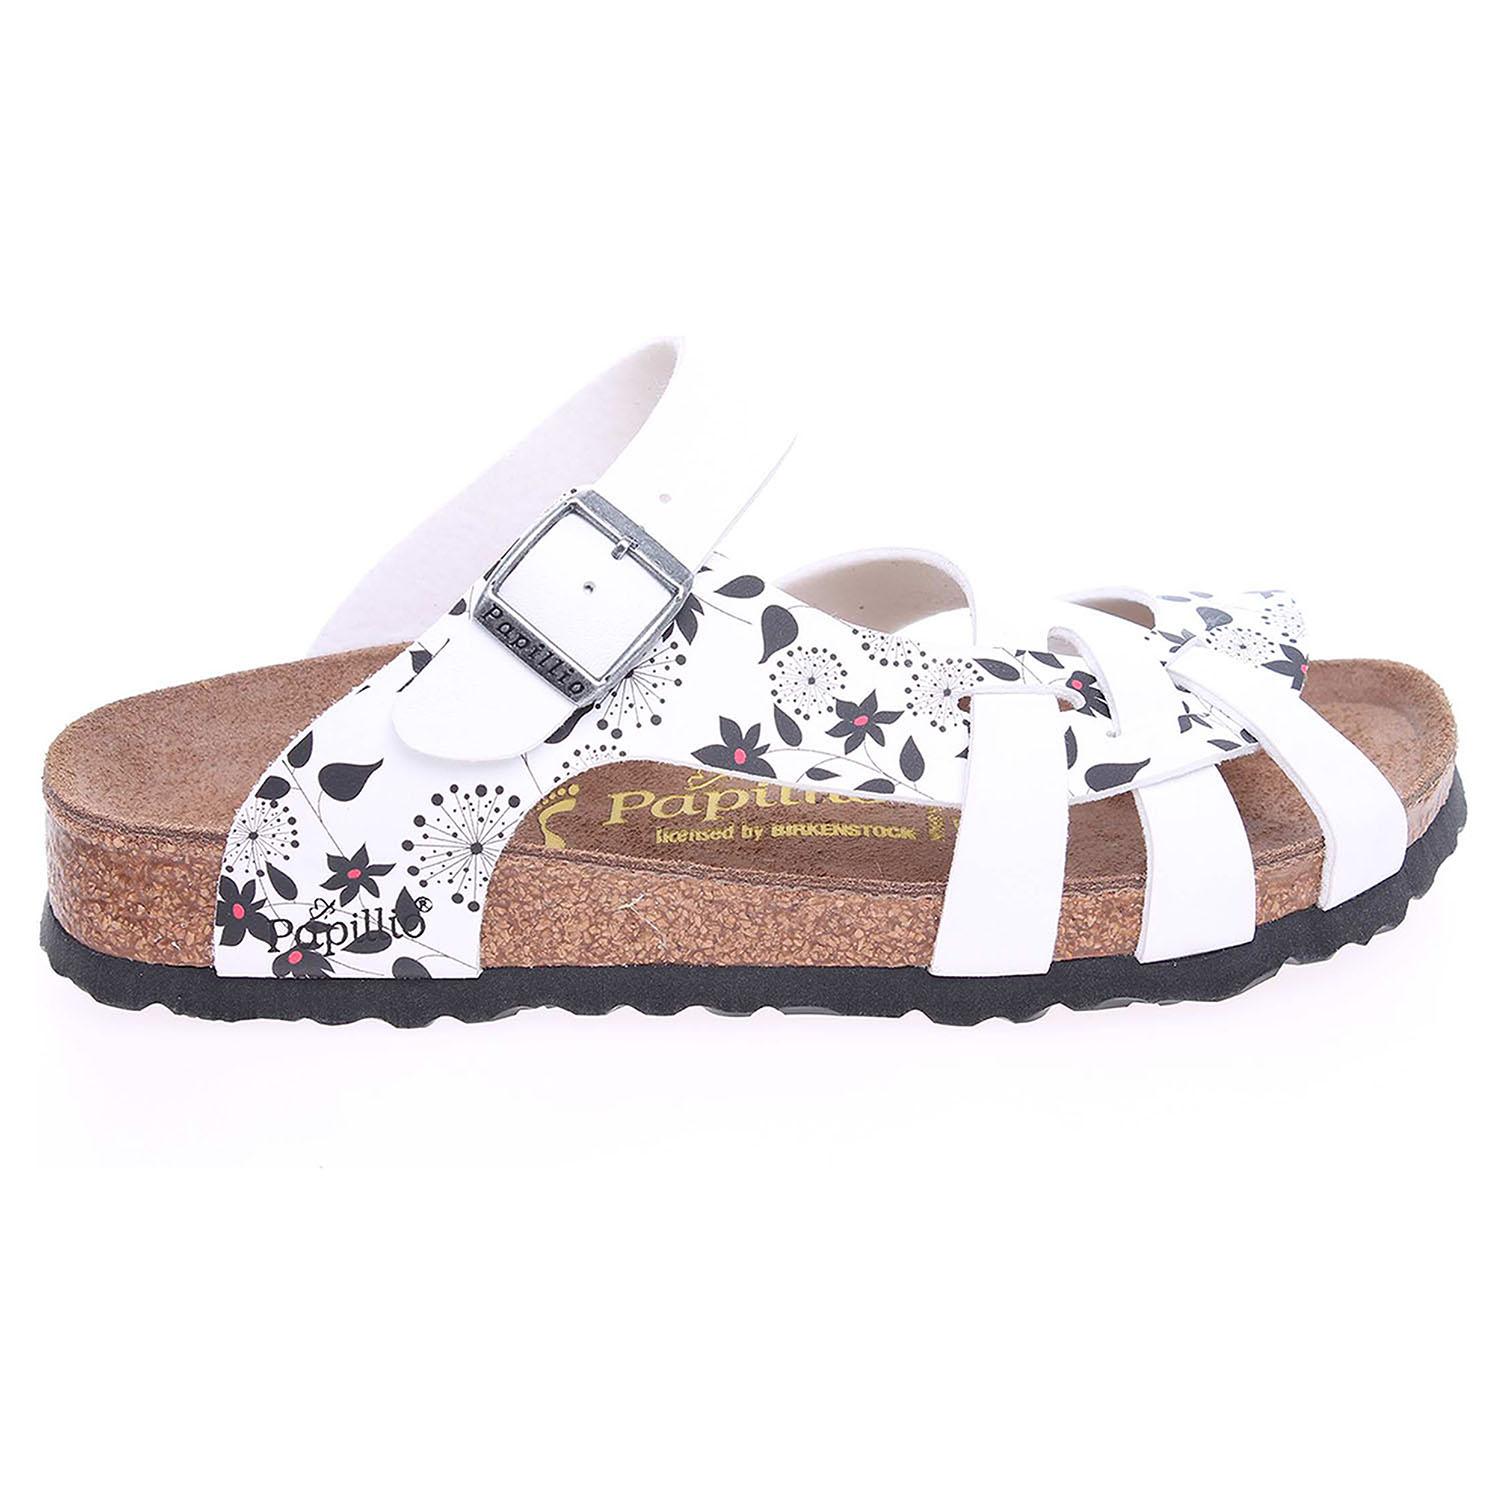 Ecco Papillio Pisa dámské pantofle 382143 bílé 23400265